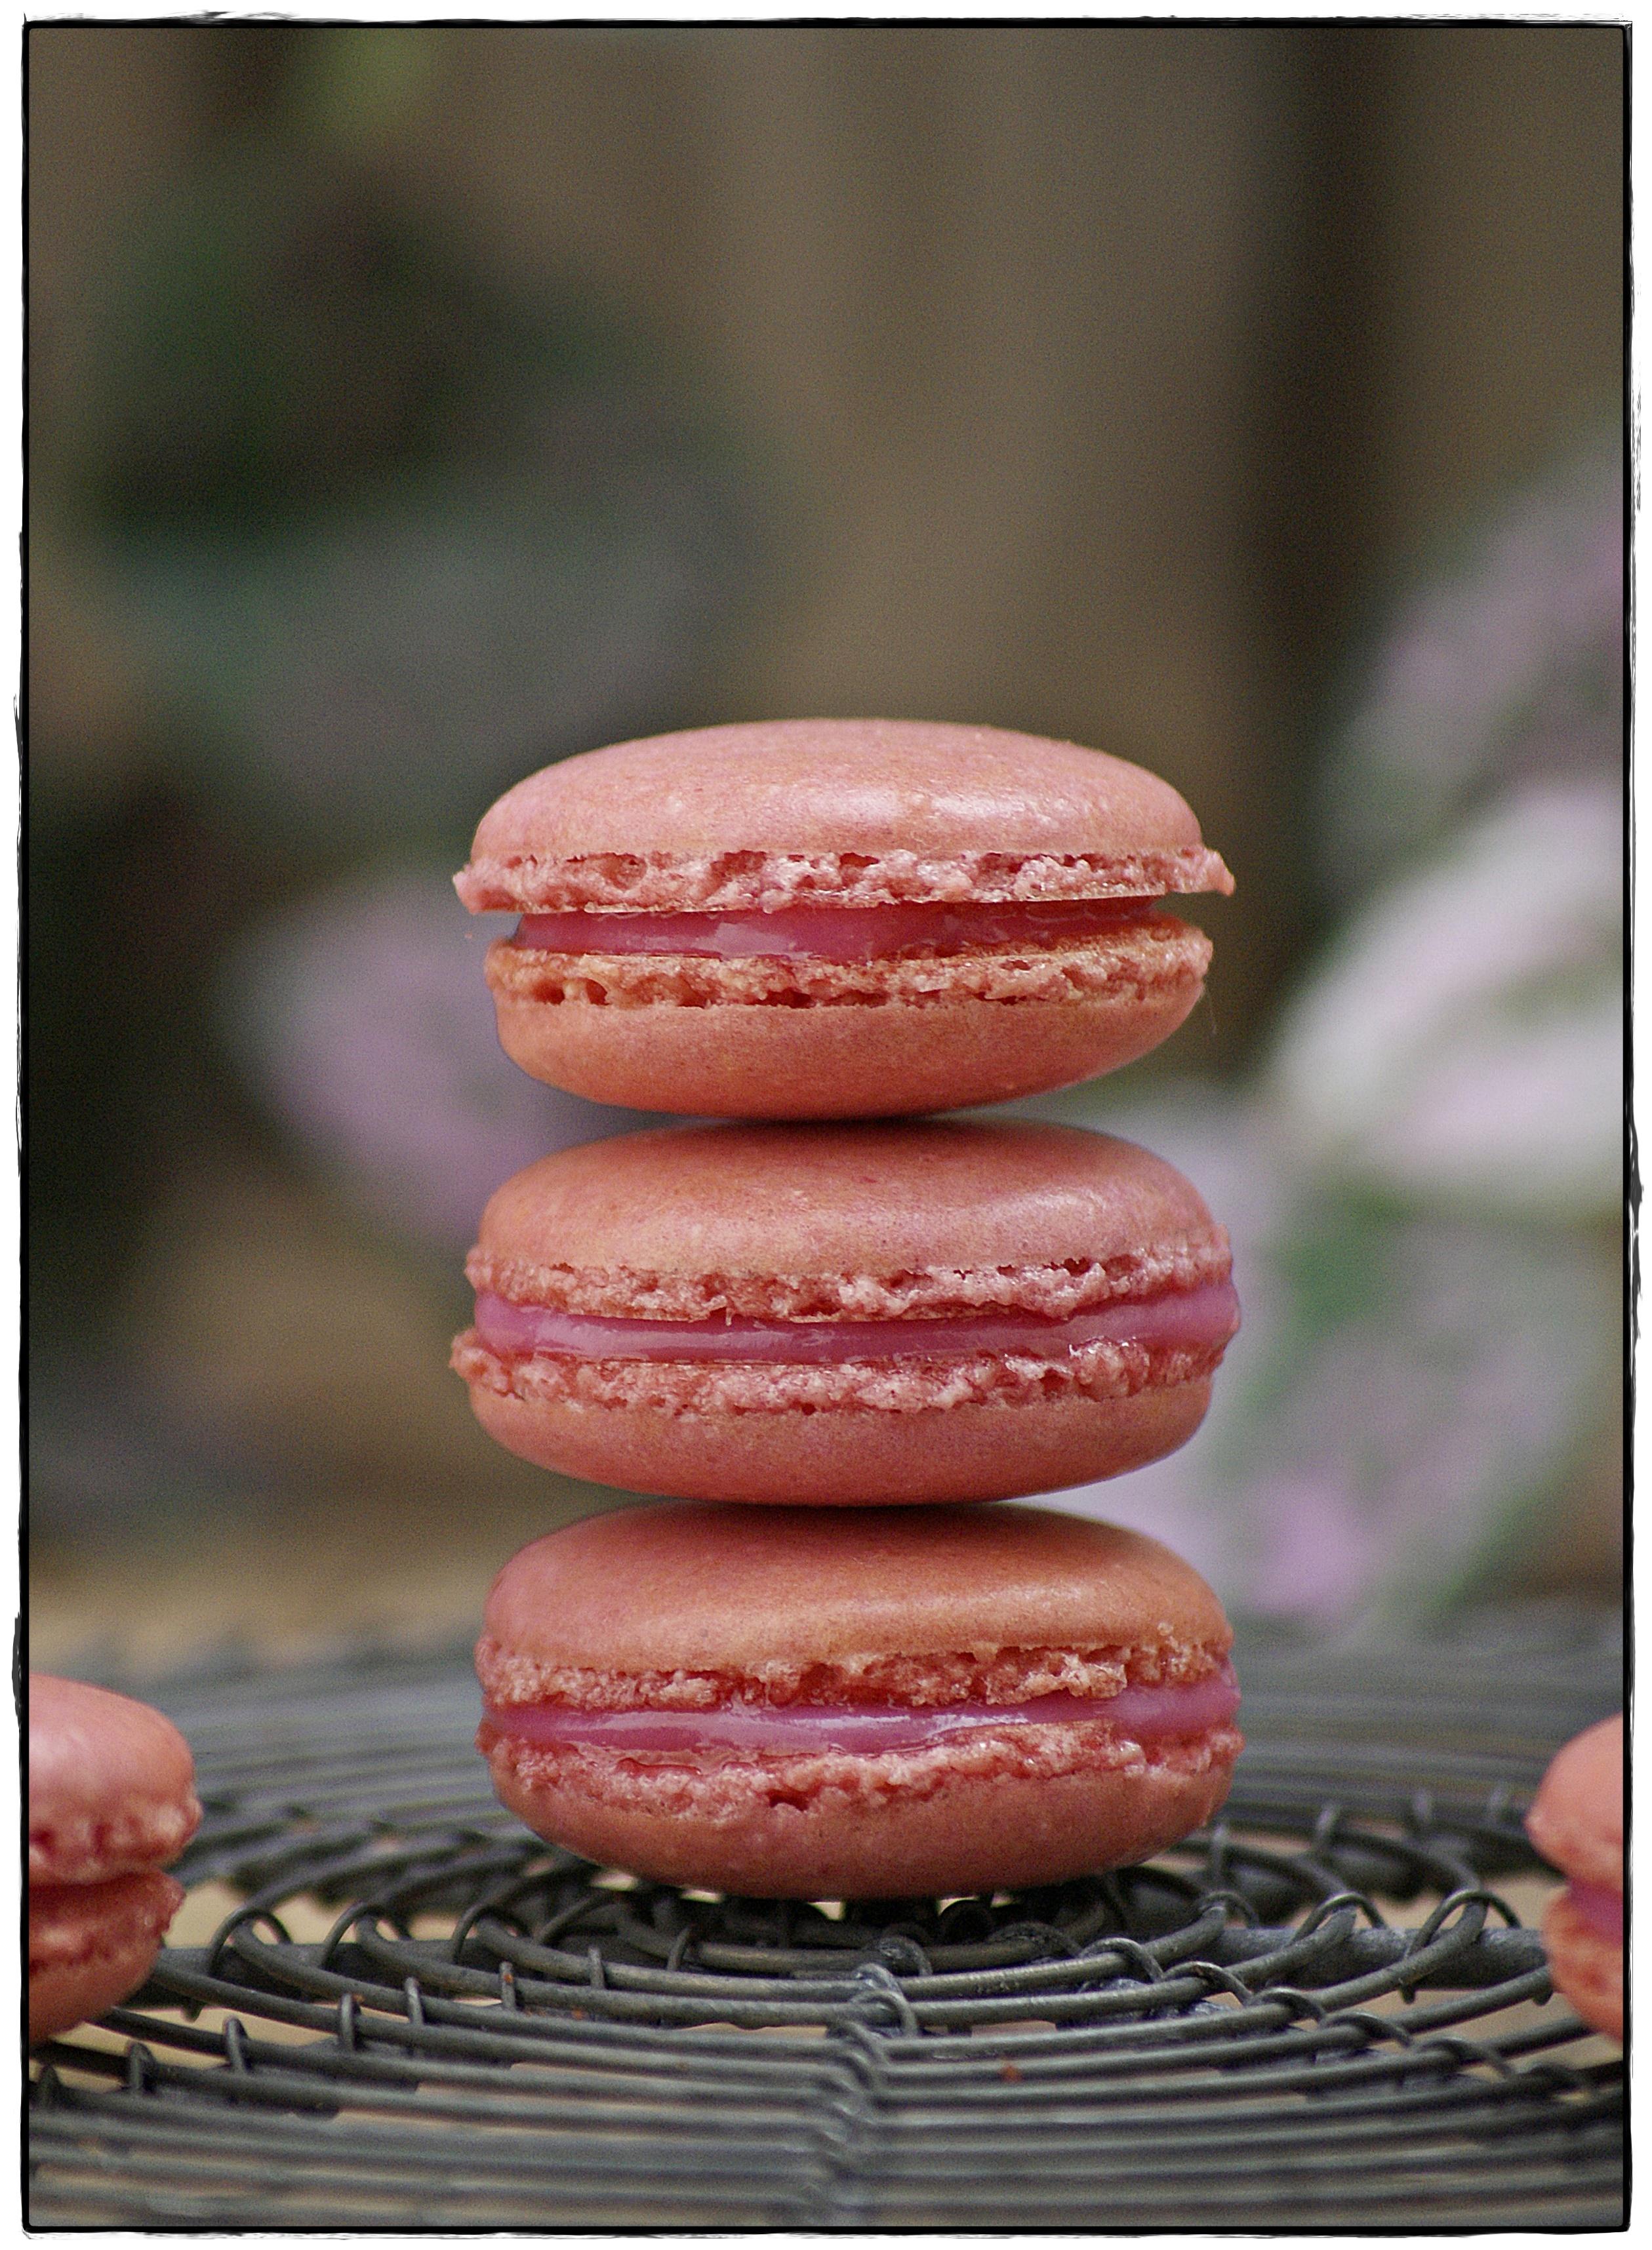 macarons de frambuesa 5.JPG